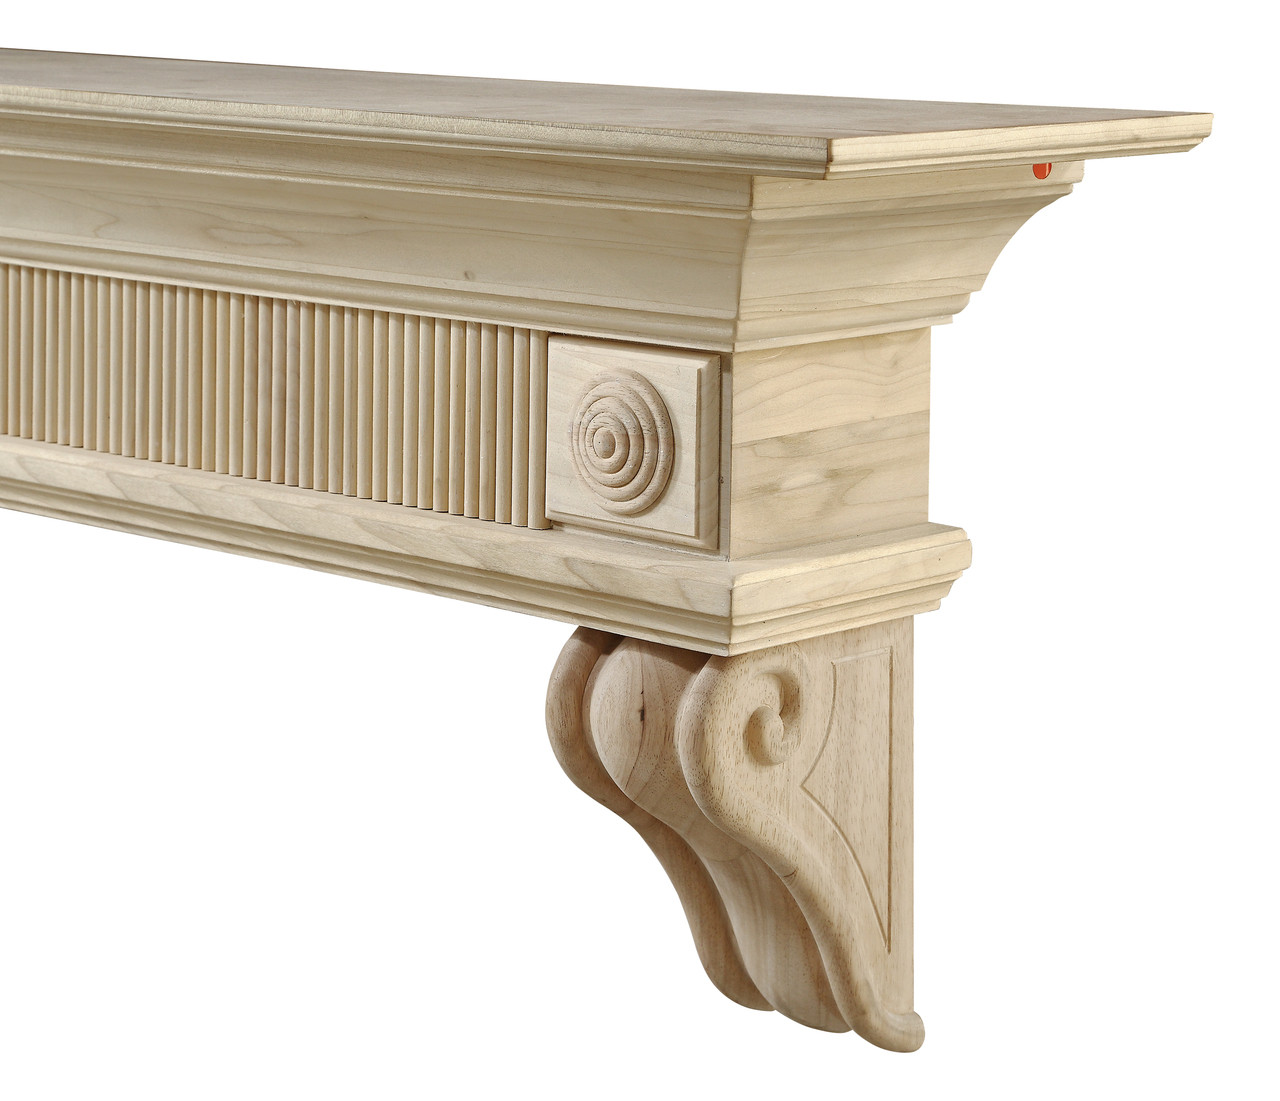 416-60 Devonshire Mantel, Unfinished Mantel Shelf (3)